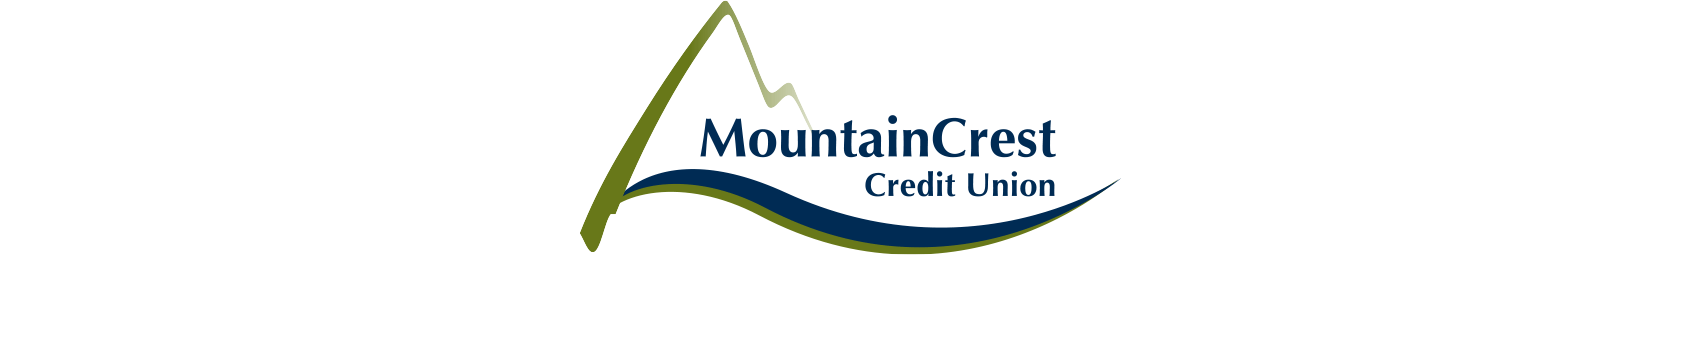 Logo Design for MountainCrest Credit Union